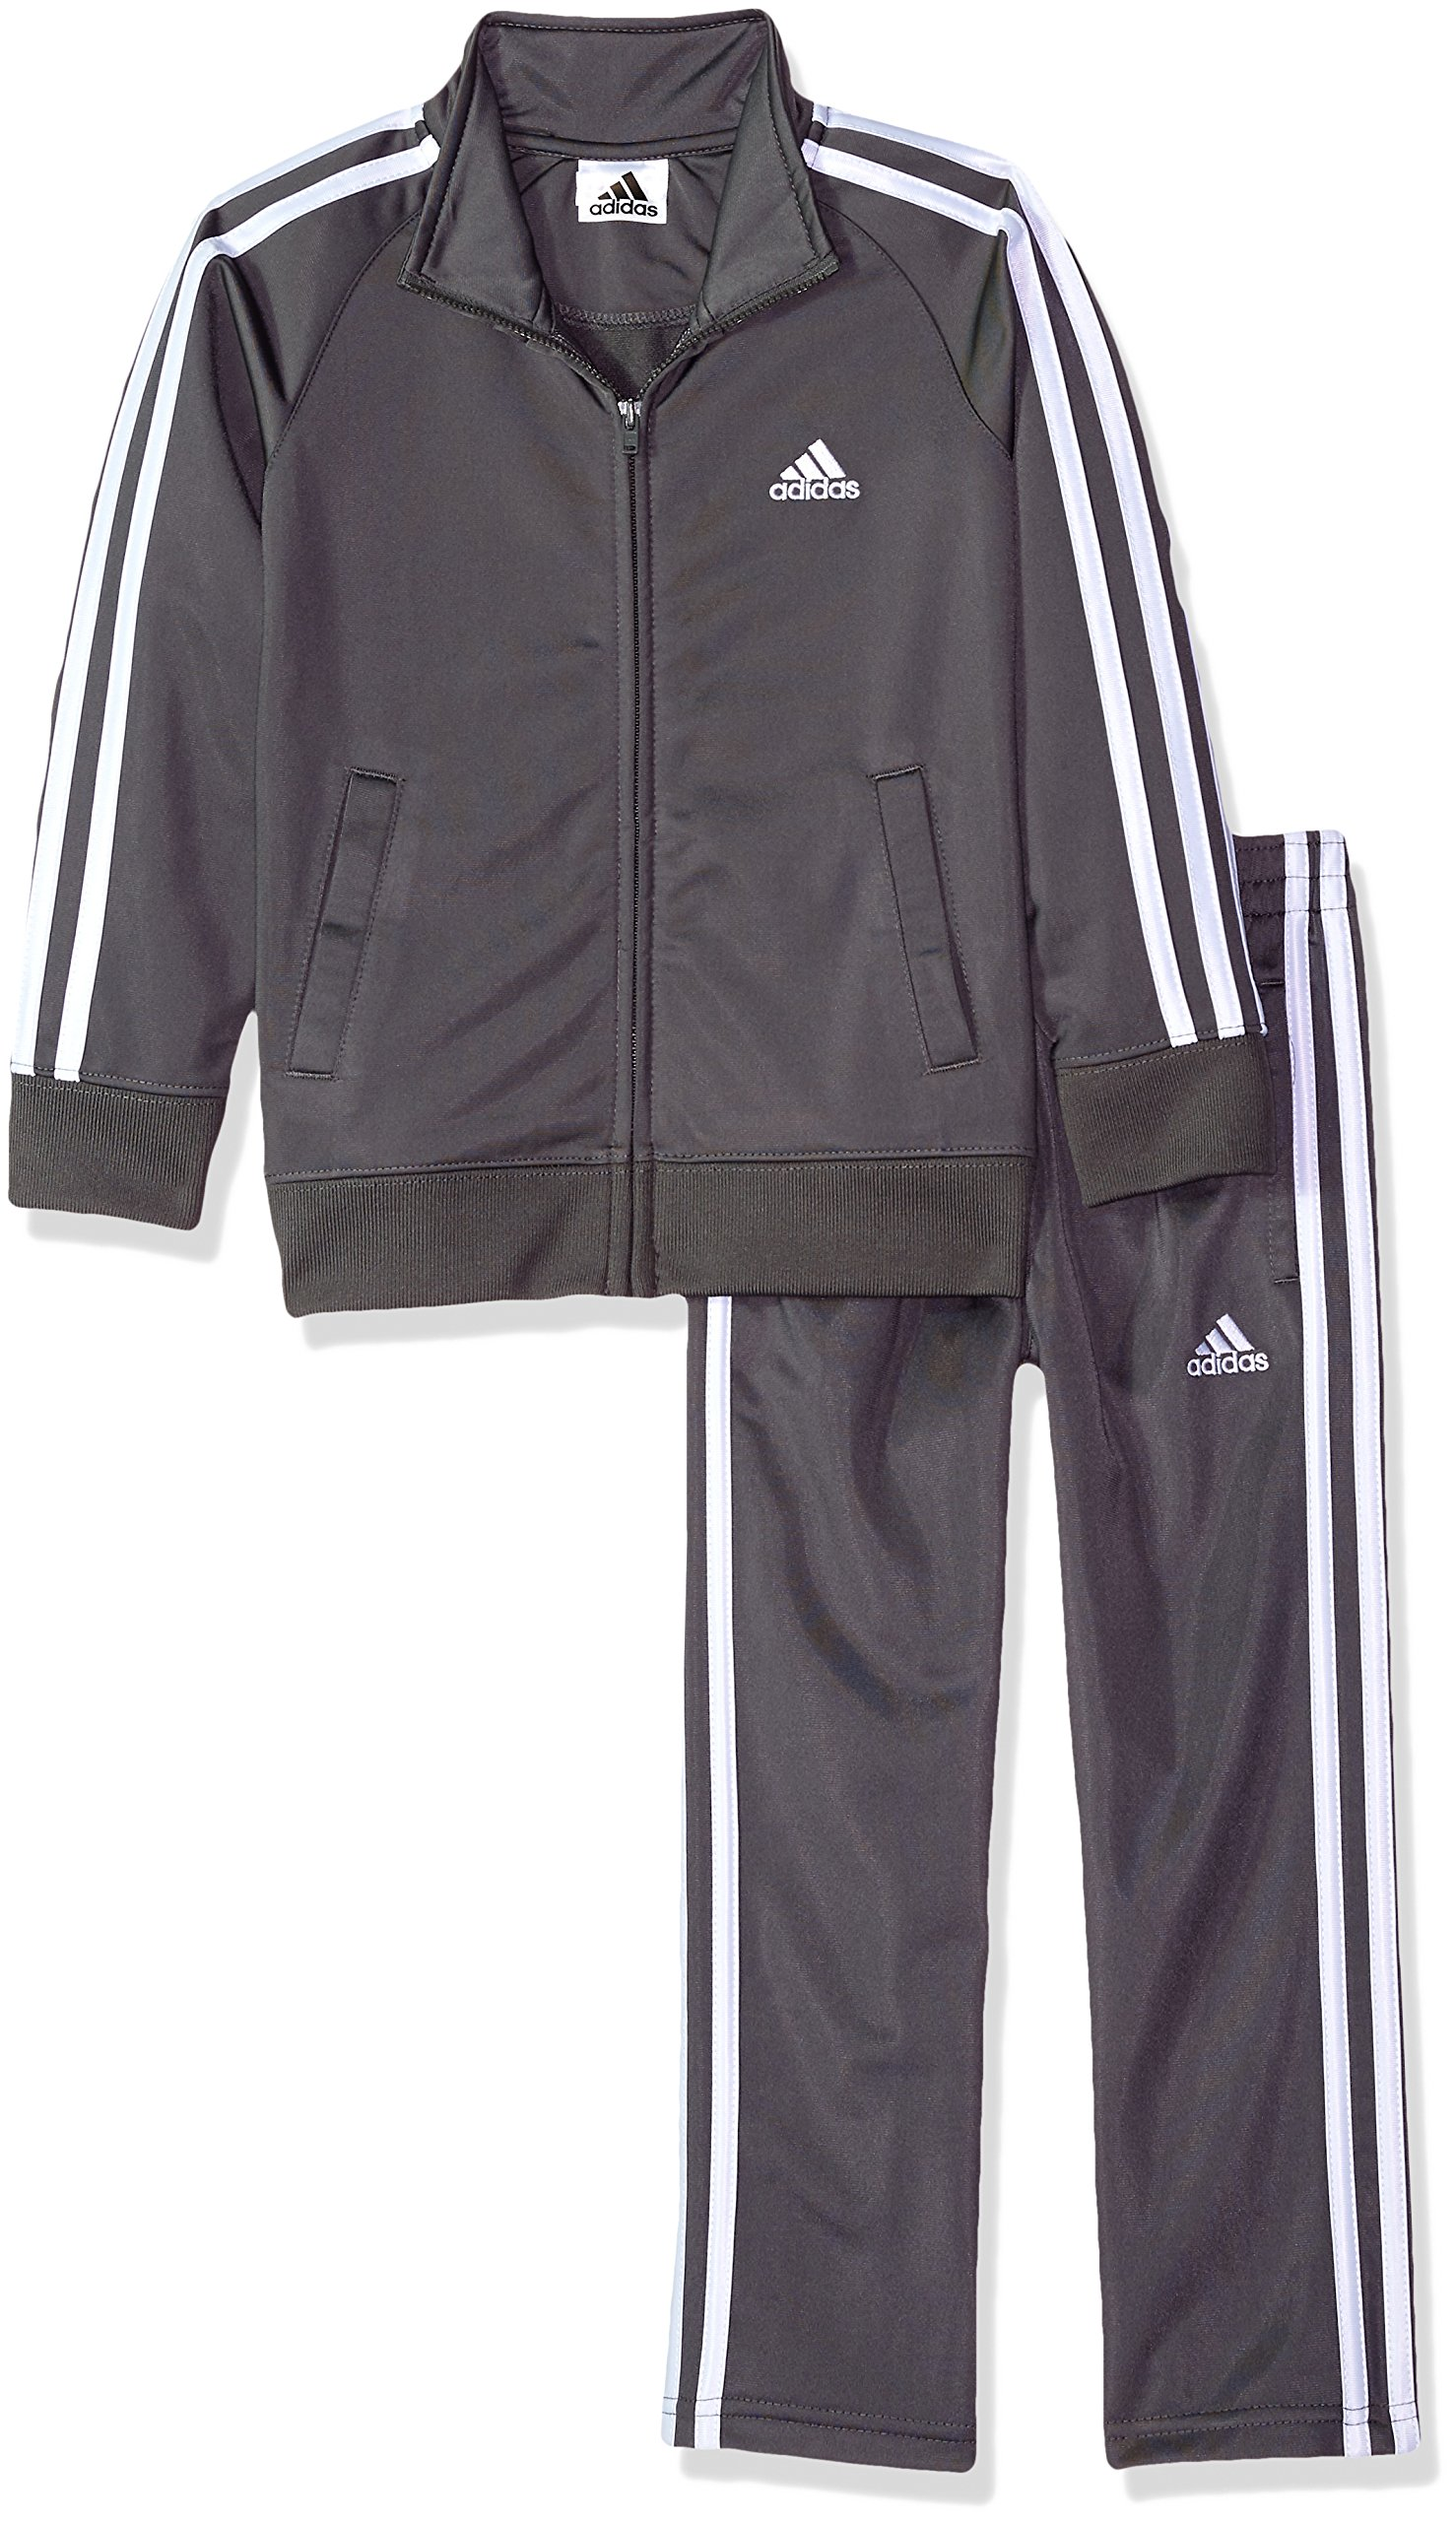 adidas Boys' Little Tricot Jacket and Pant Set, Grey Five Adi, 7